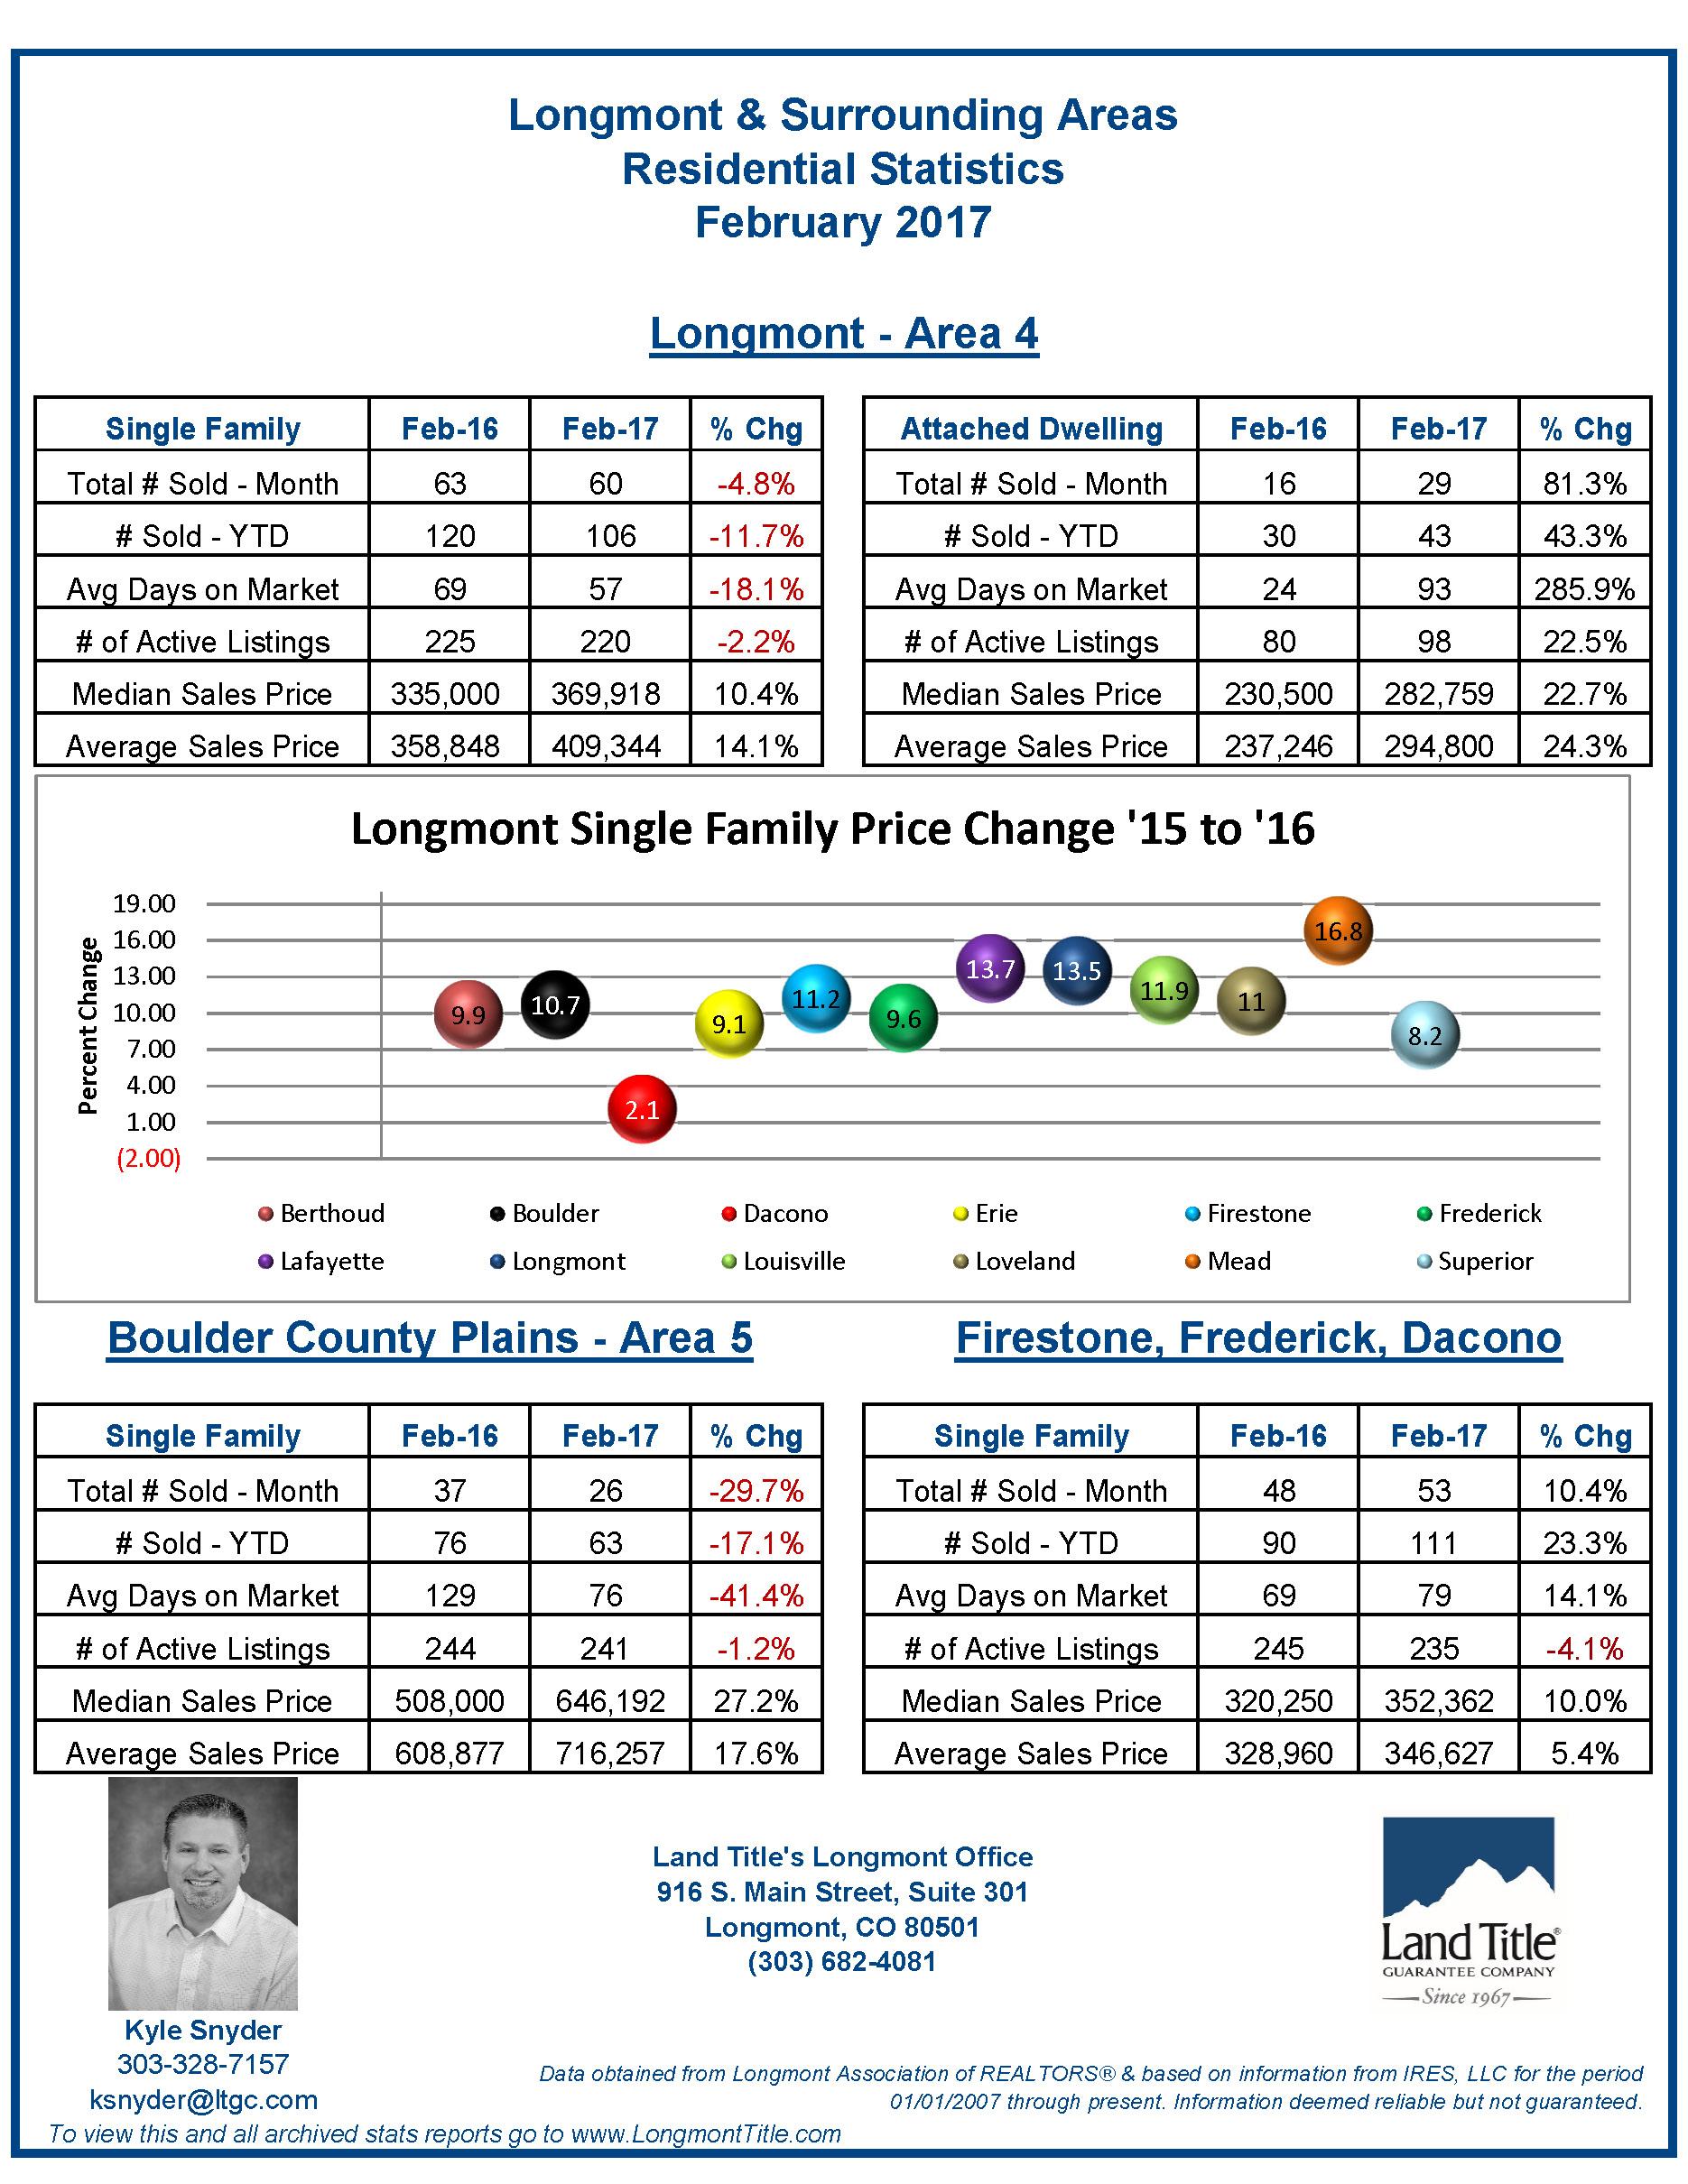 Longmont Statistics February 2017